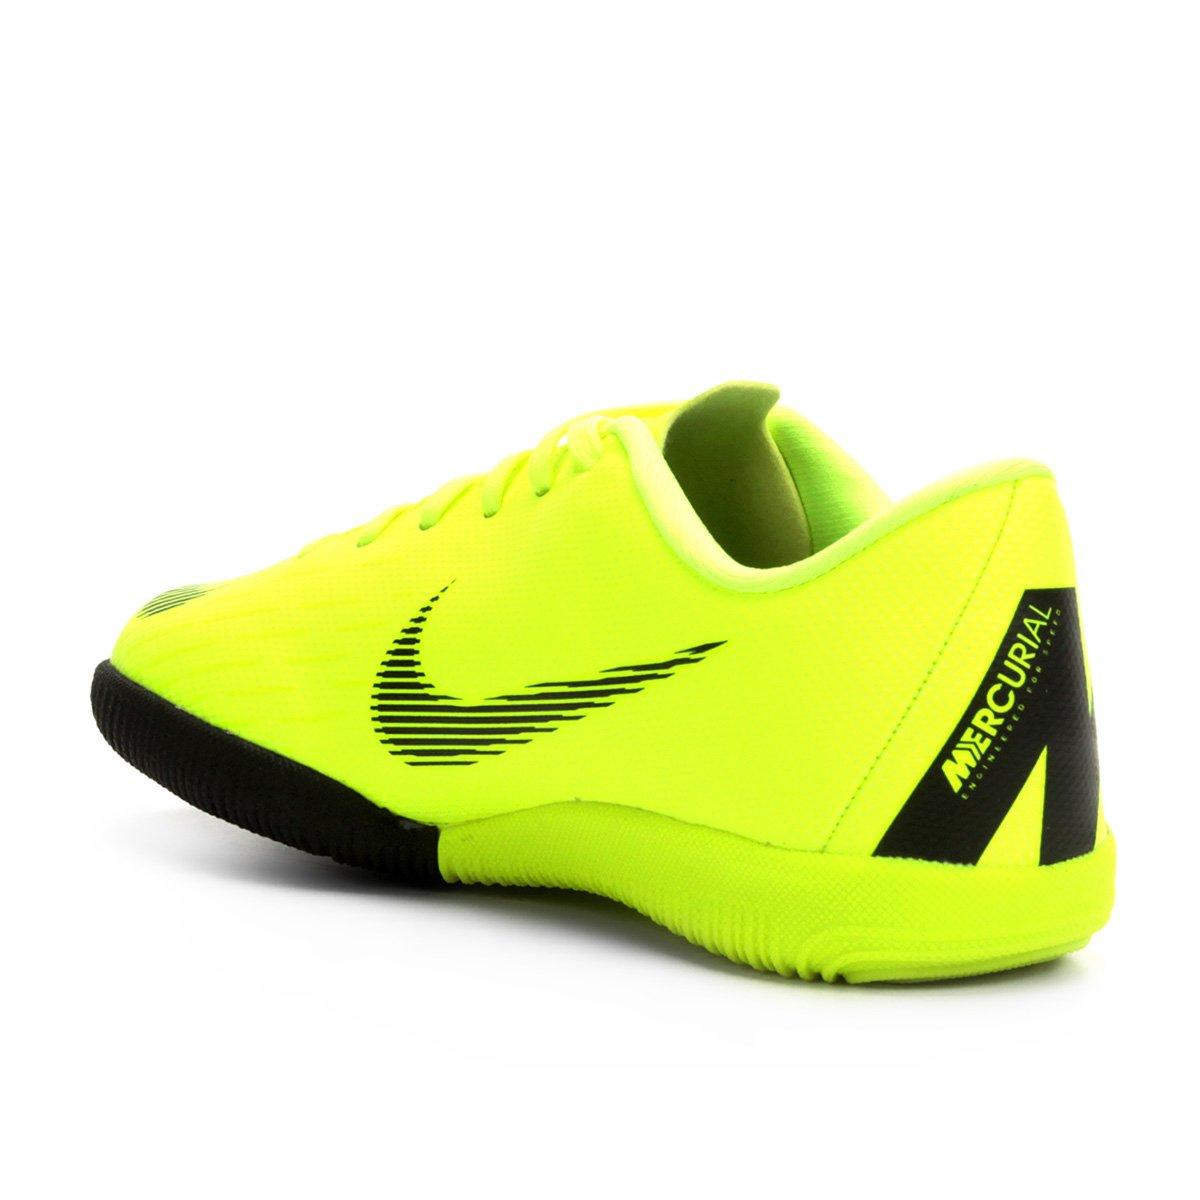 ... Chuteira Futsal Infantil Nike Mercurial Vapor 12 Academy GS IC ... da0d2035c49ab